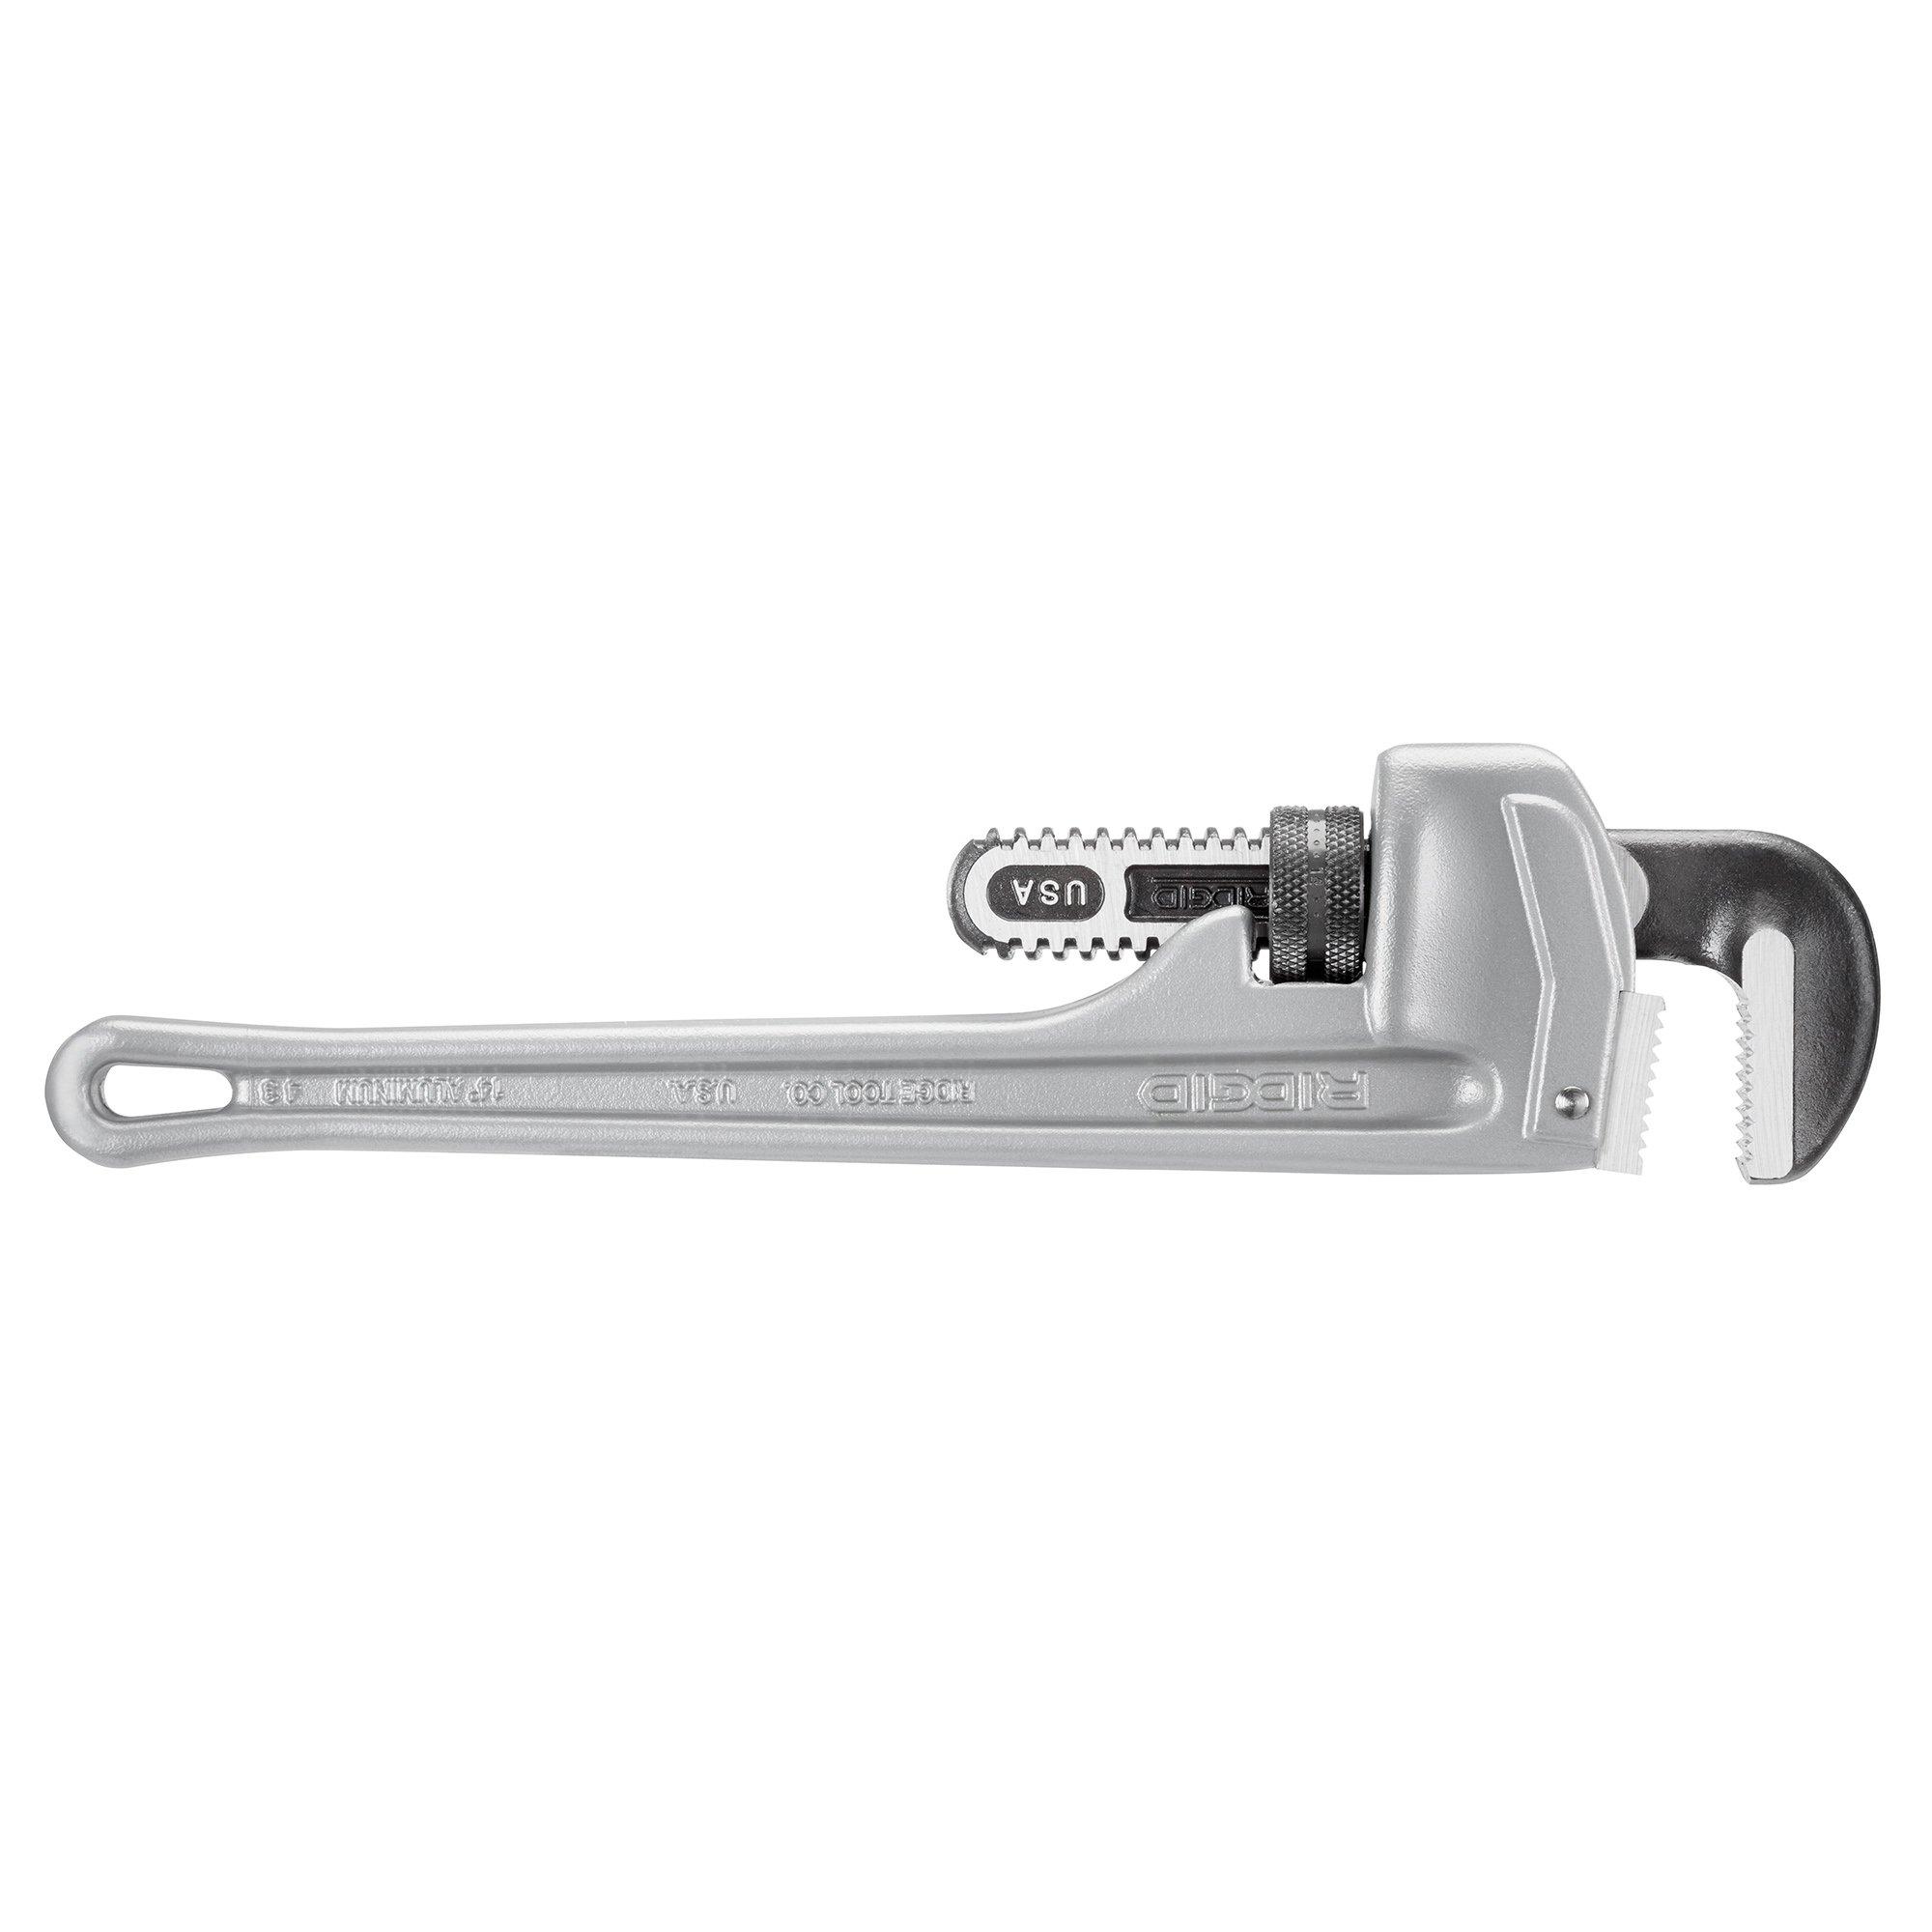 RIDGID 31095 Model 814 Aluminum Straight Pipe Wrench, 14-inch Plumbing Wrench